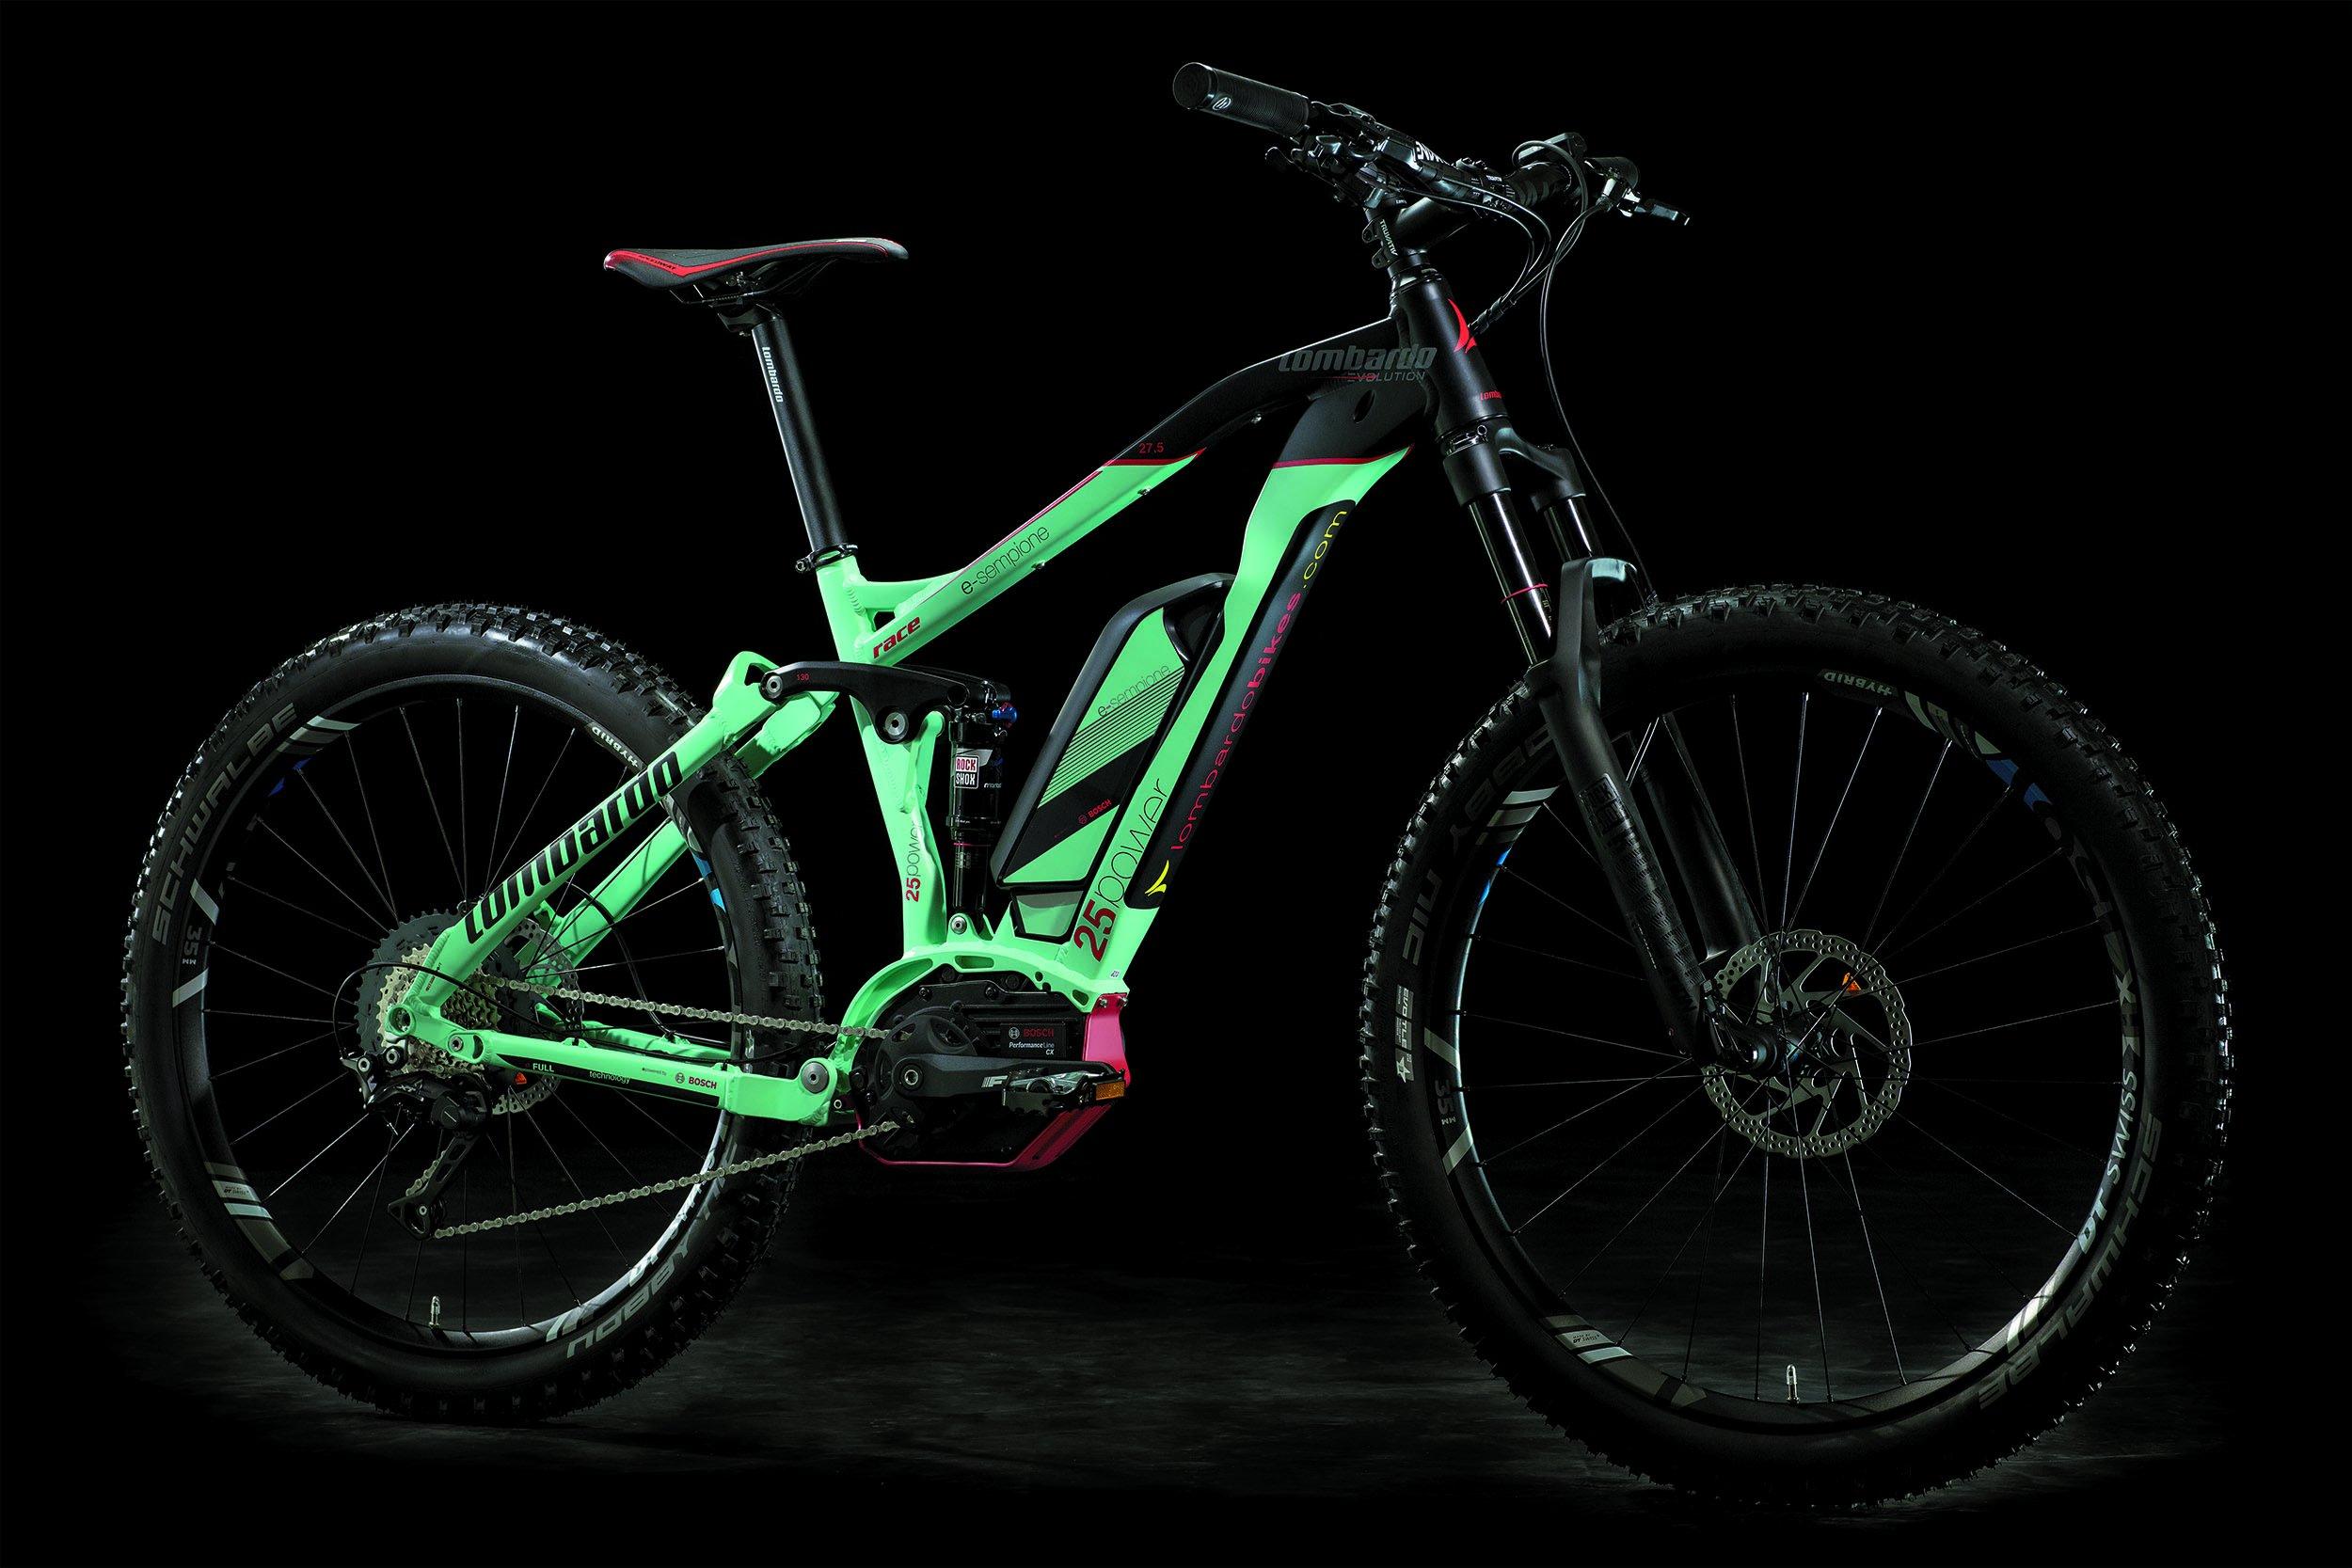 205d5f9517b Lombardo Sempione biammortizzata Race All Mountain 27.5 Full Suspension 2018  – Size 16 - Best Electric Cycle Bikes